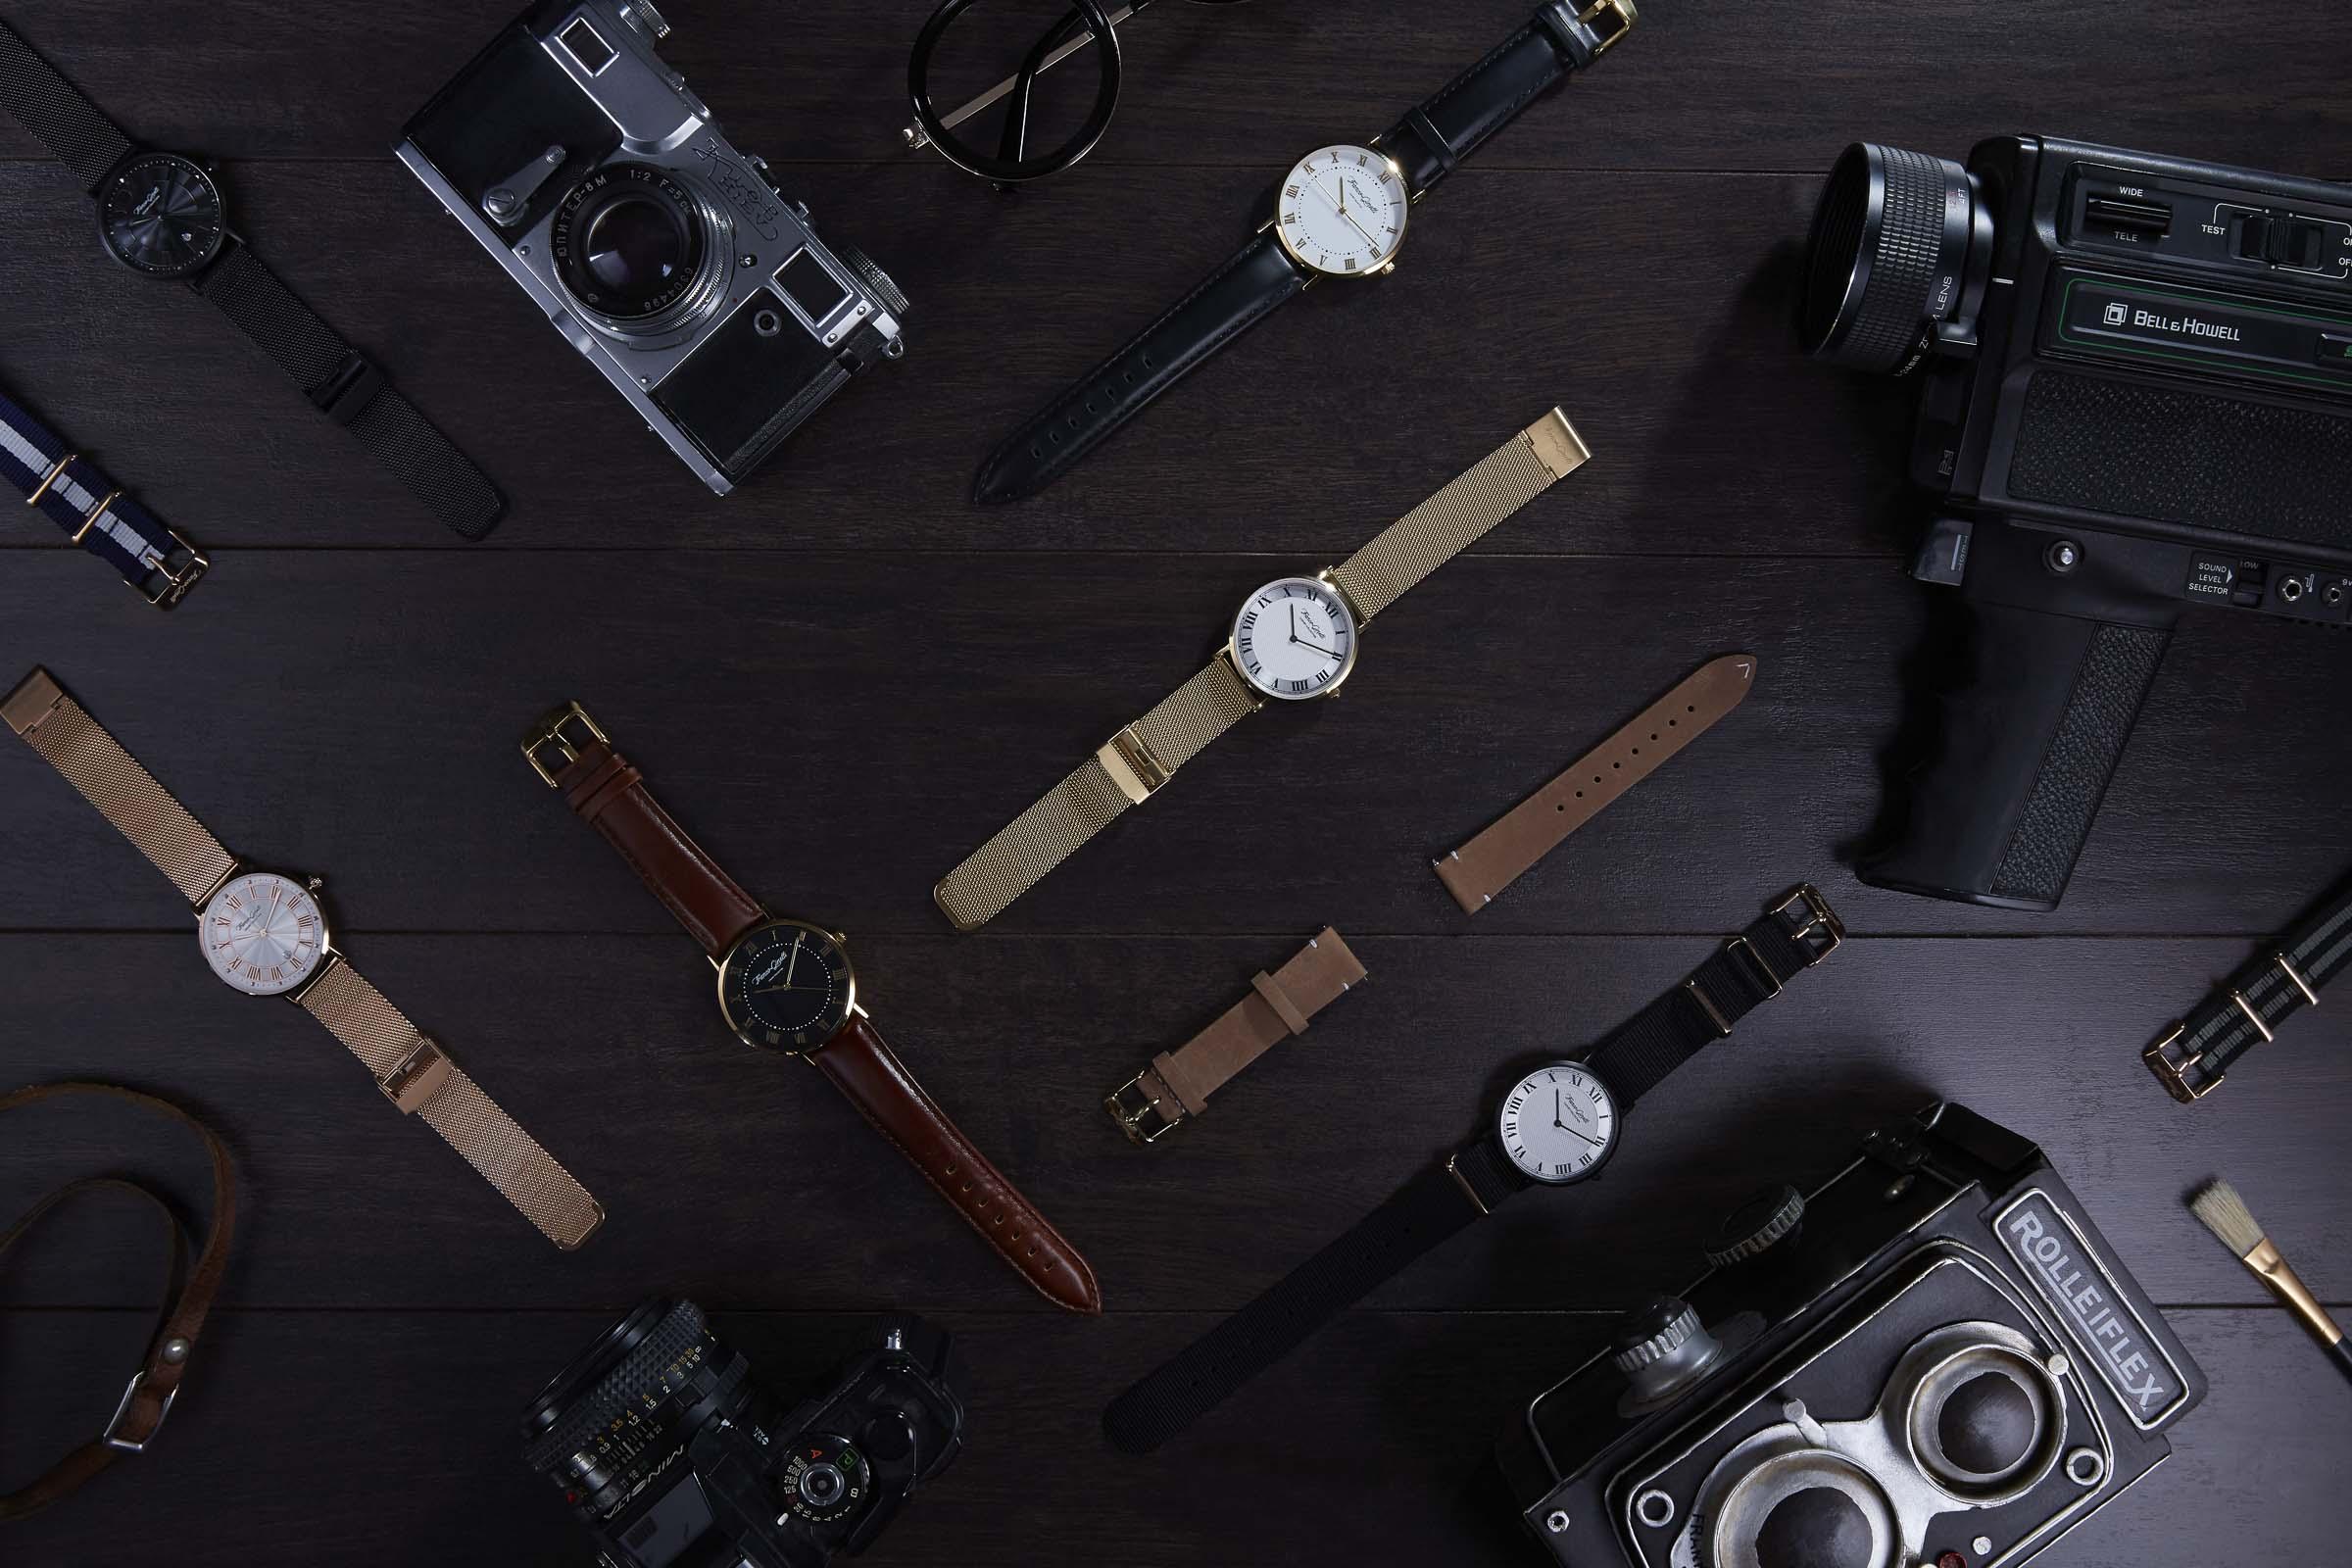 photographe-commercial-montreal-montre-14